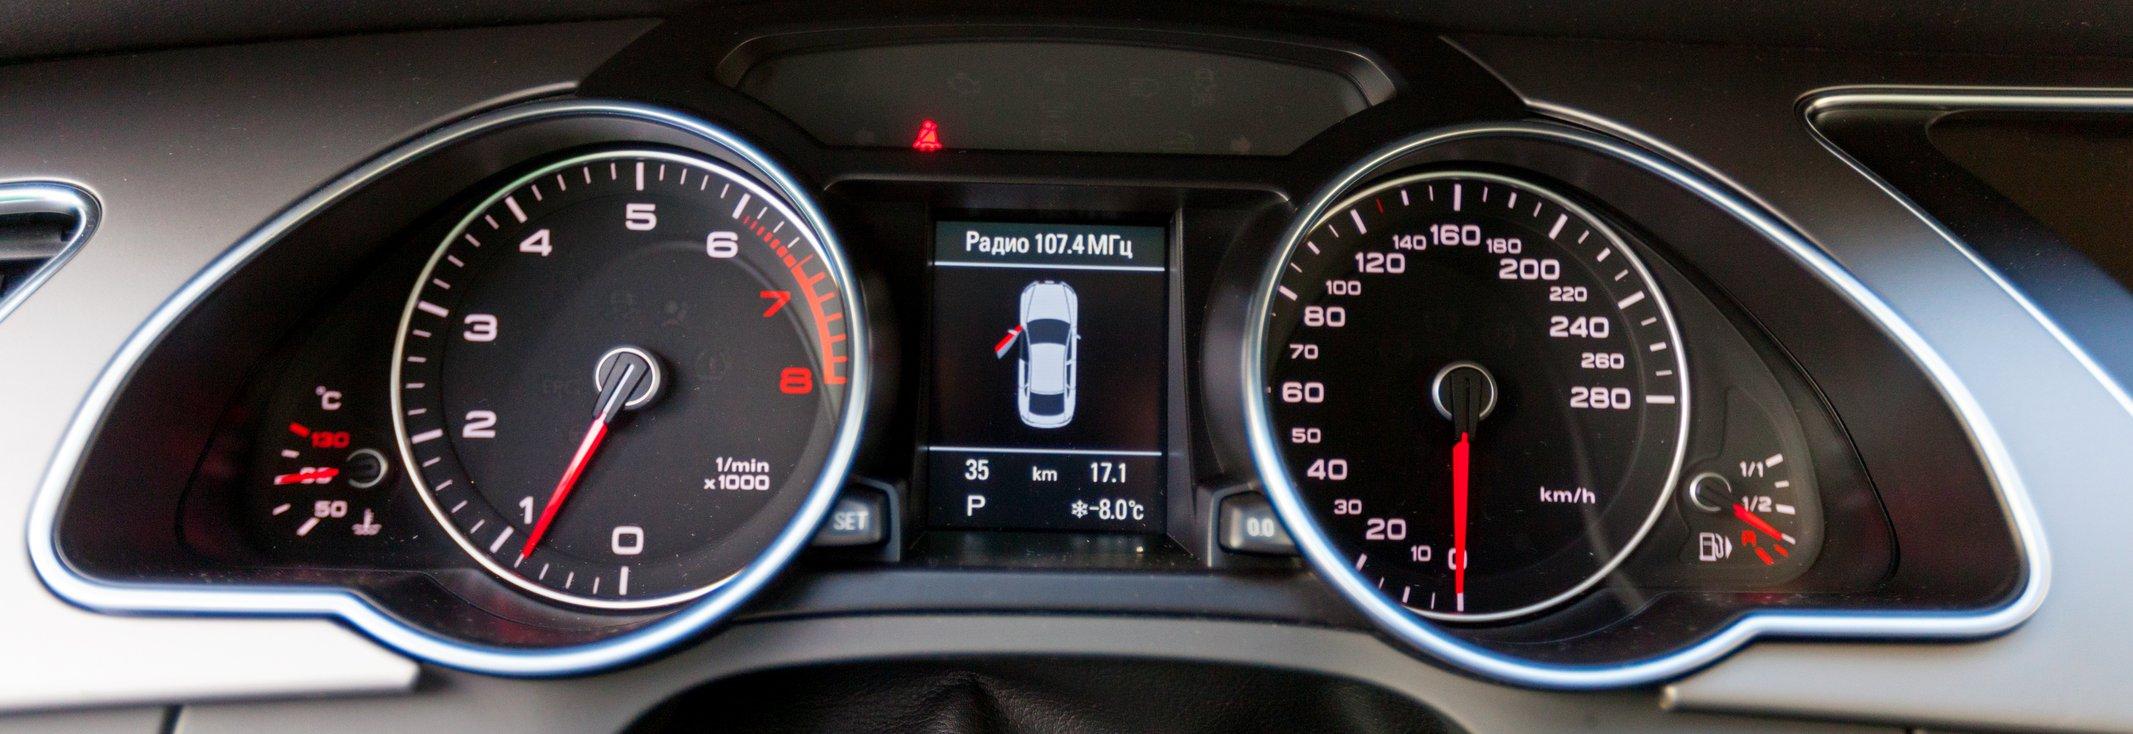 Щиток приборов Audi A5 Sportback